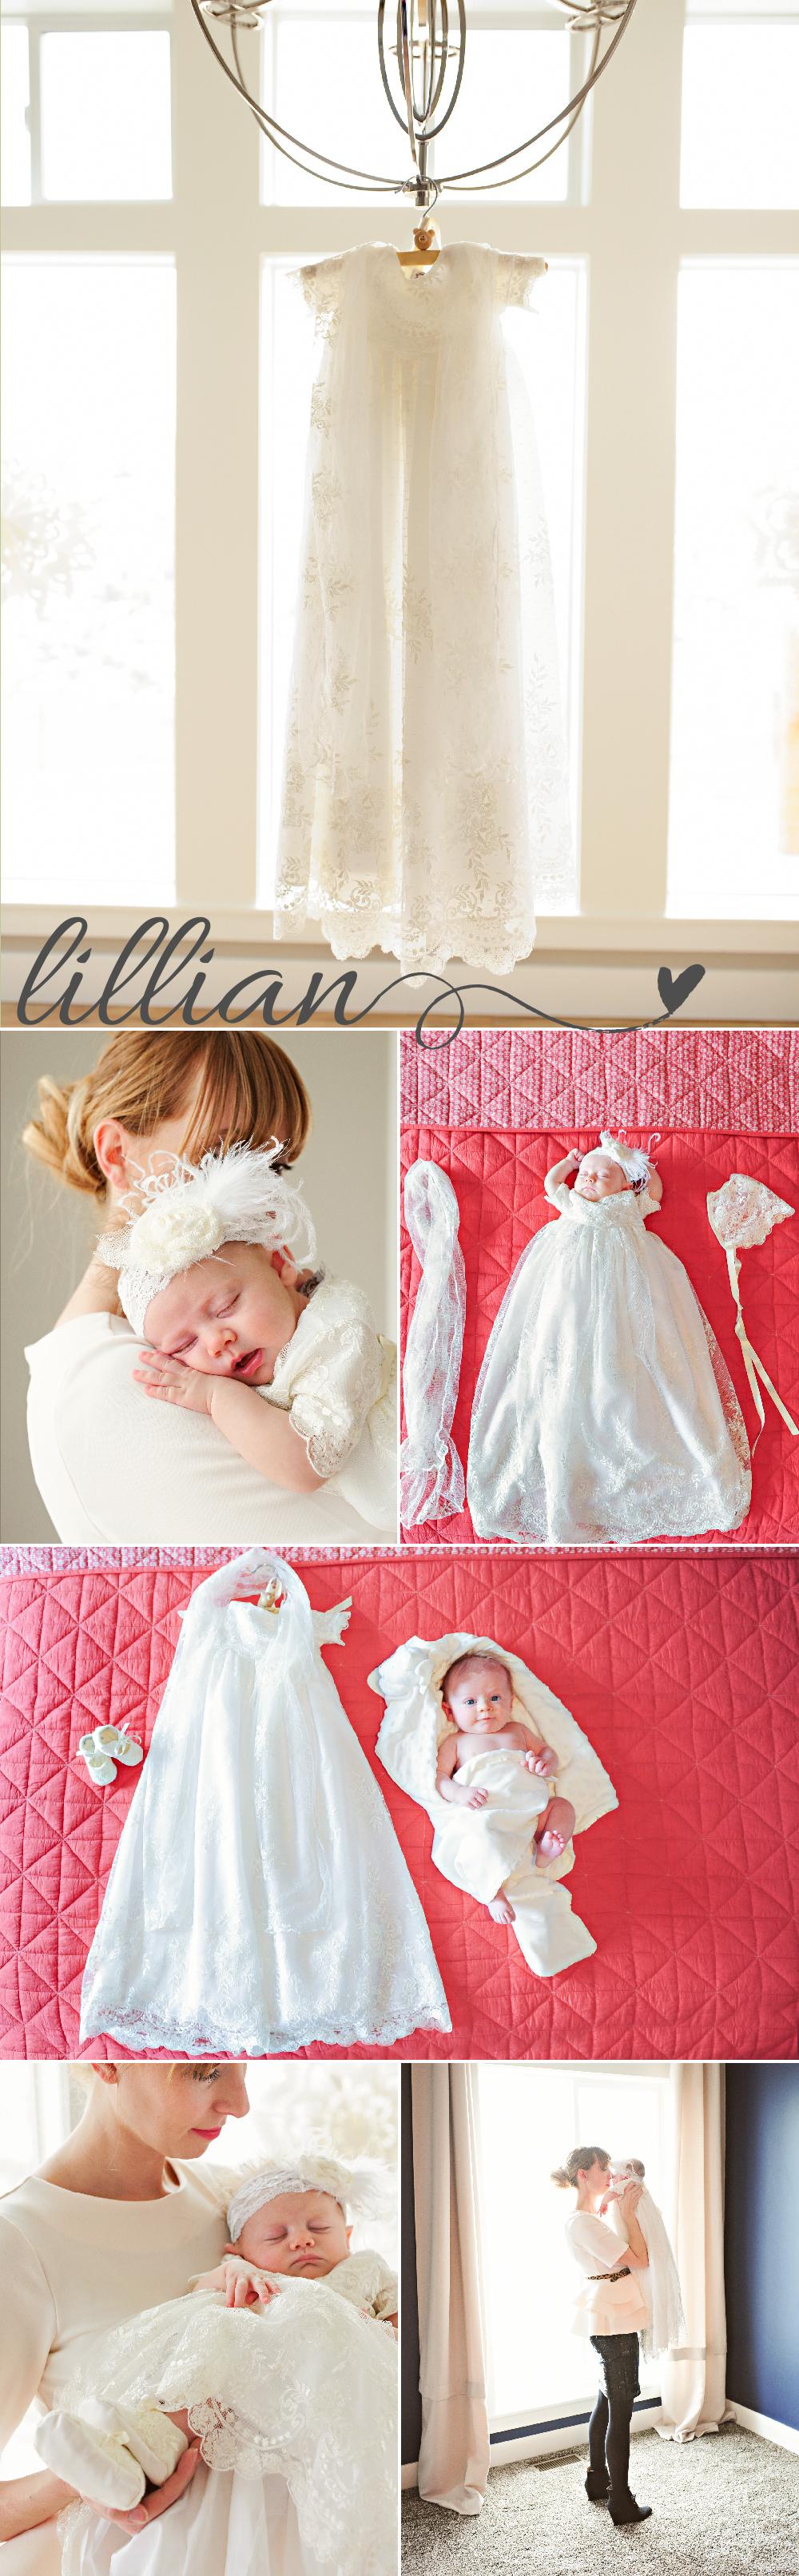 Lillian Winter Christening Gowns